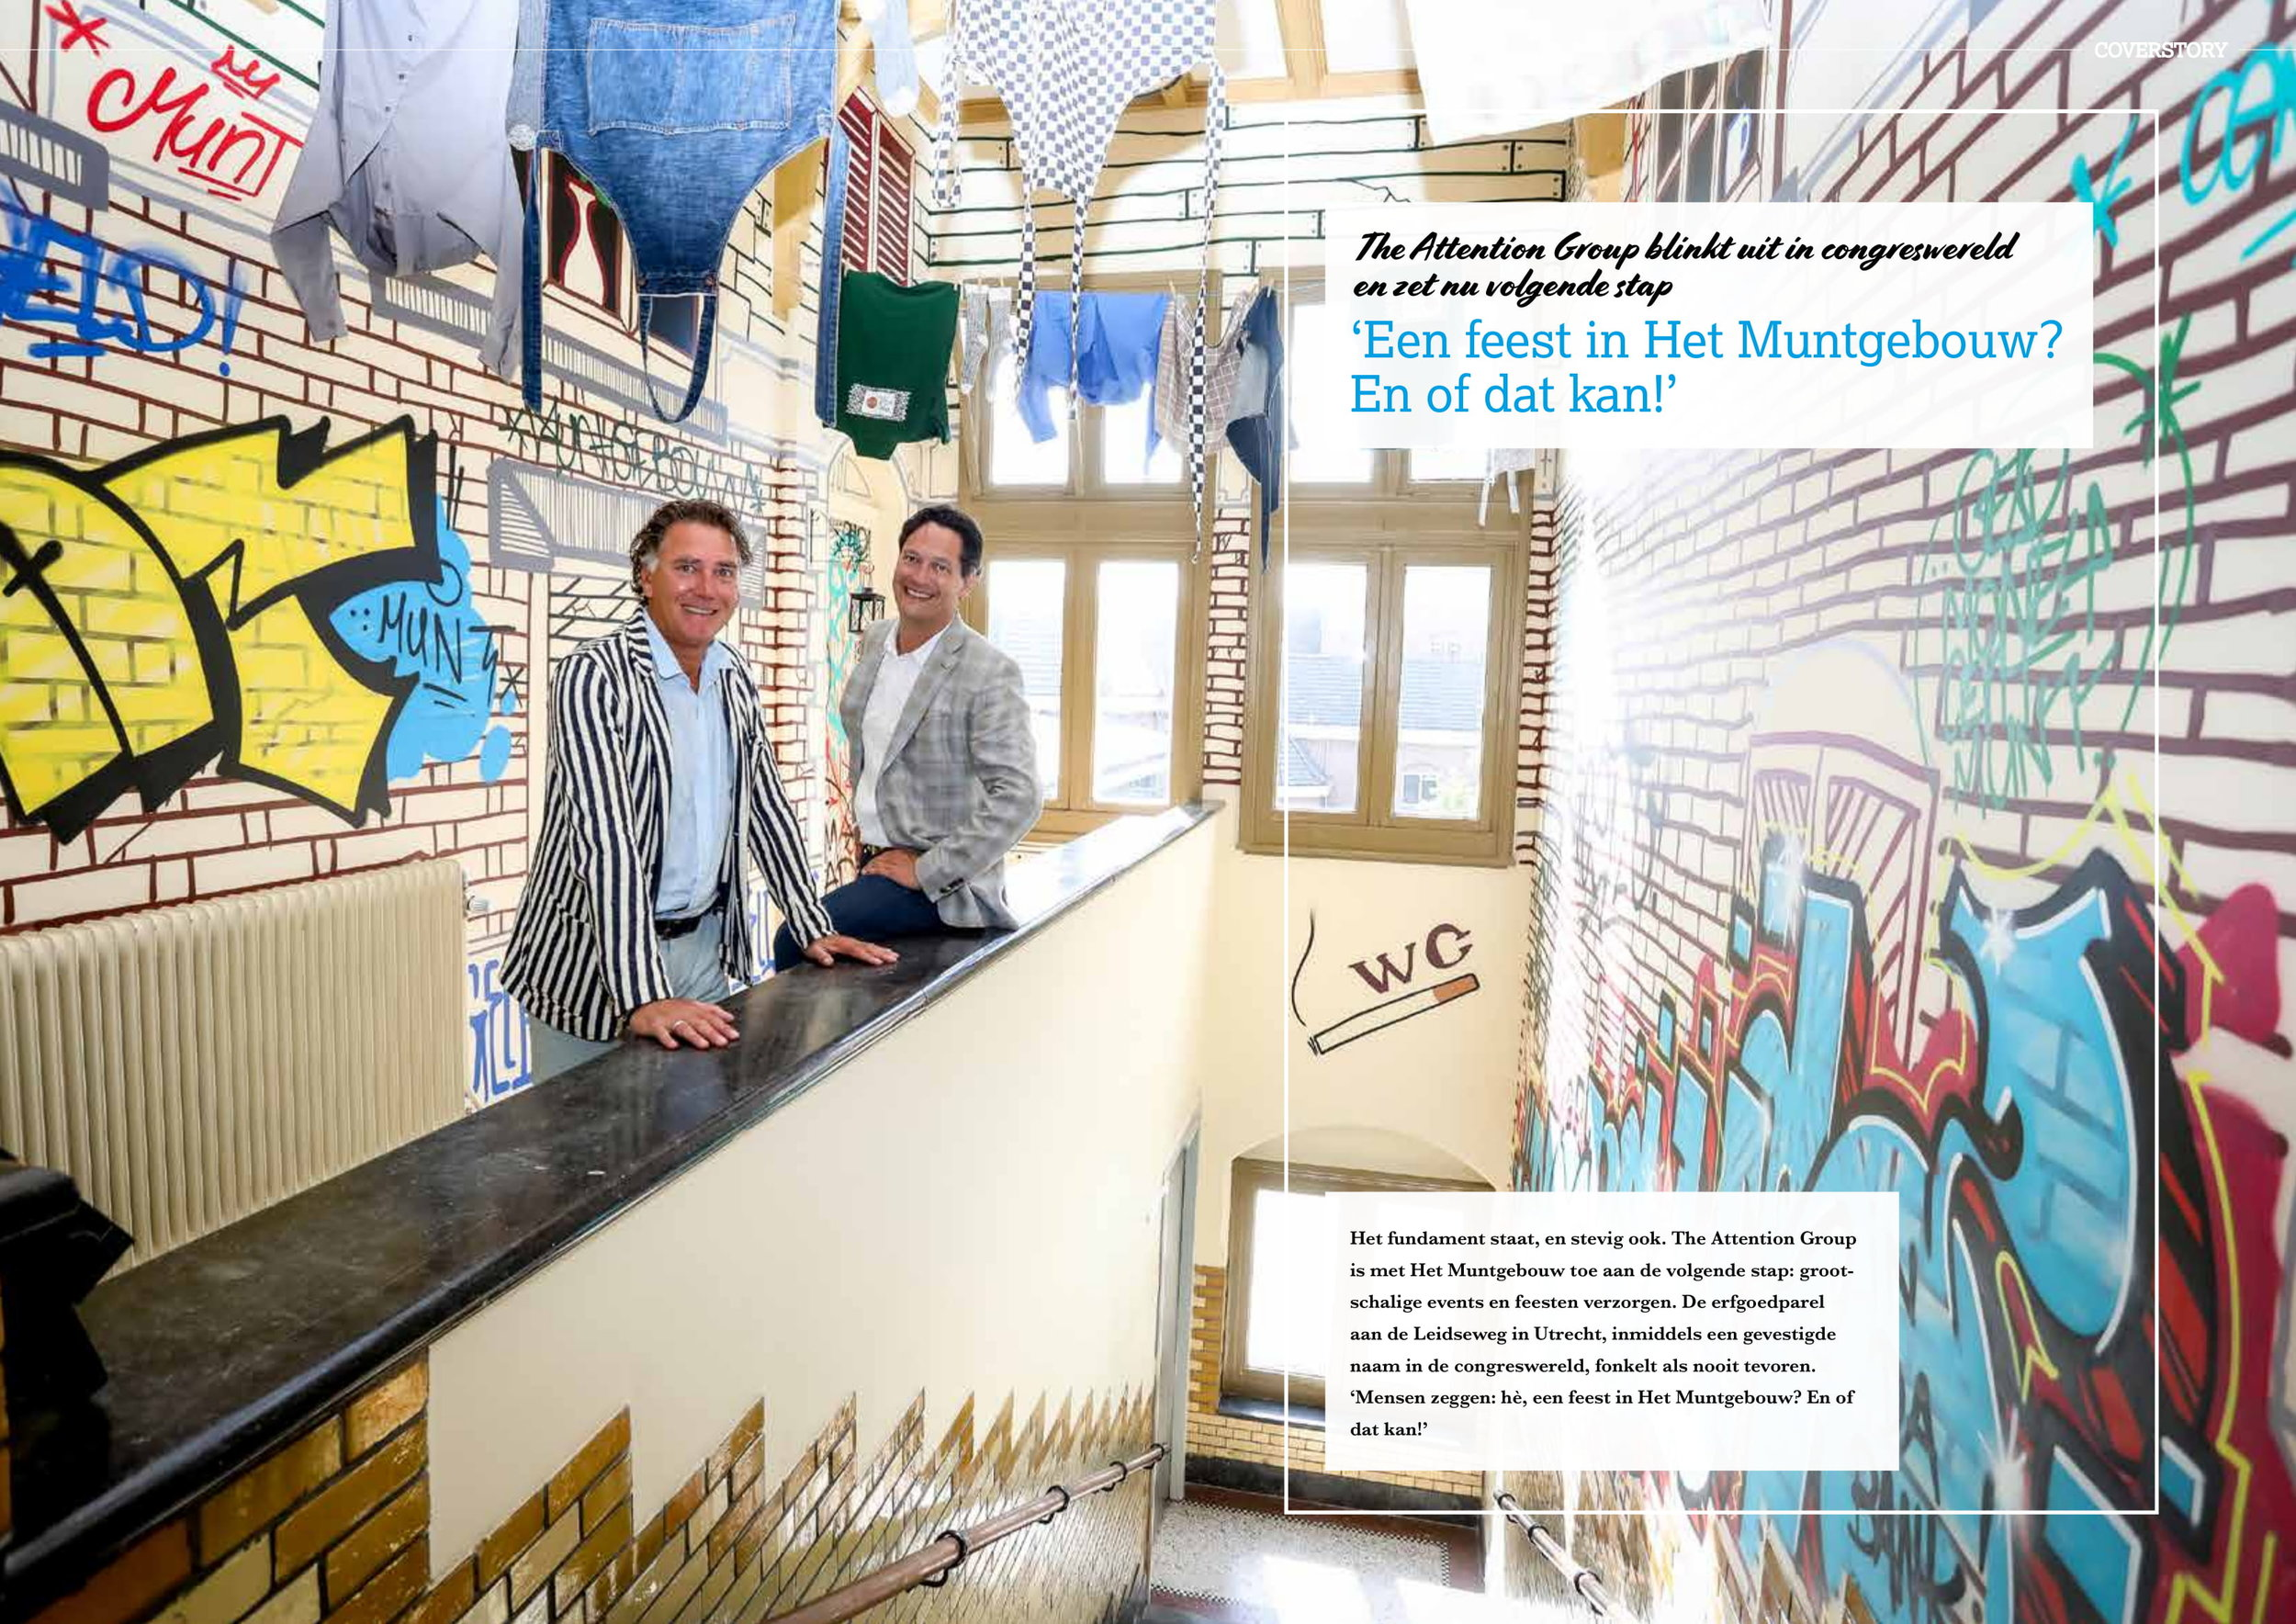 ONutrecht_herfst2018_Muntgebouw_coverstory-1.jpg